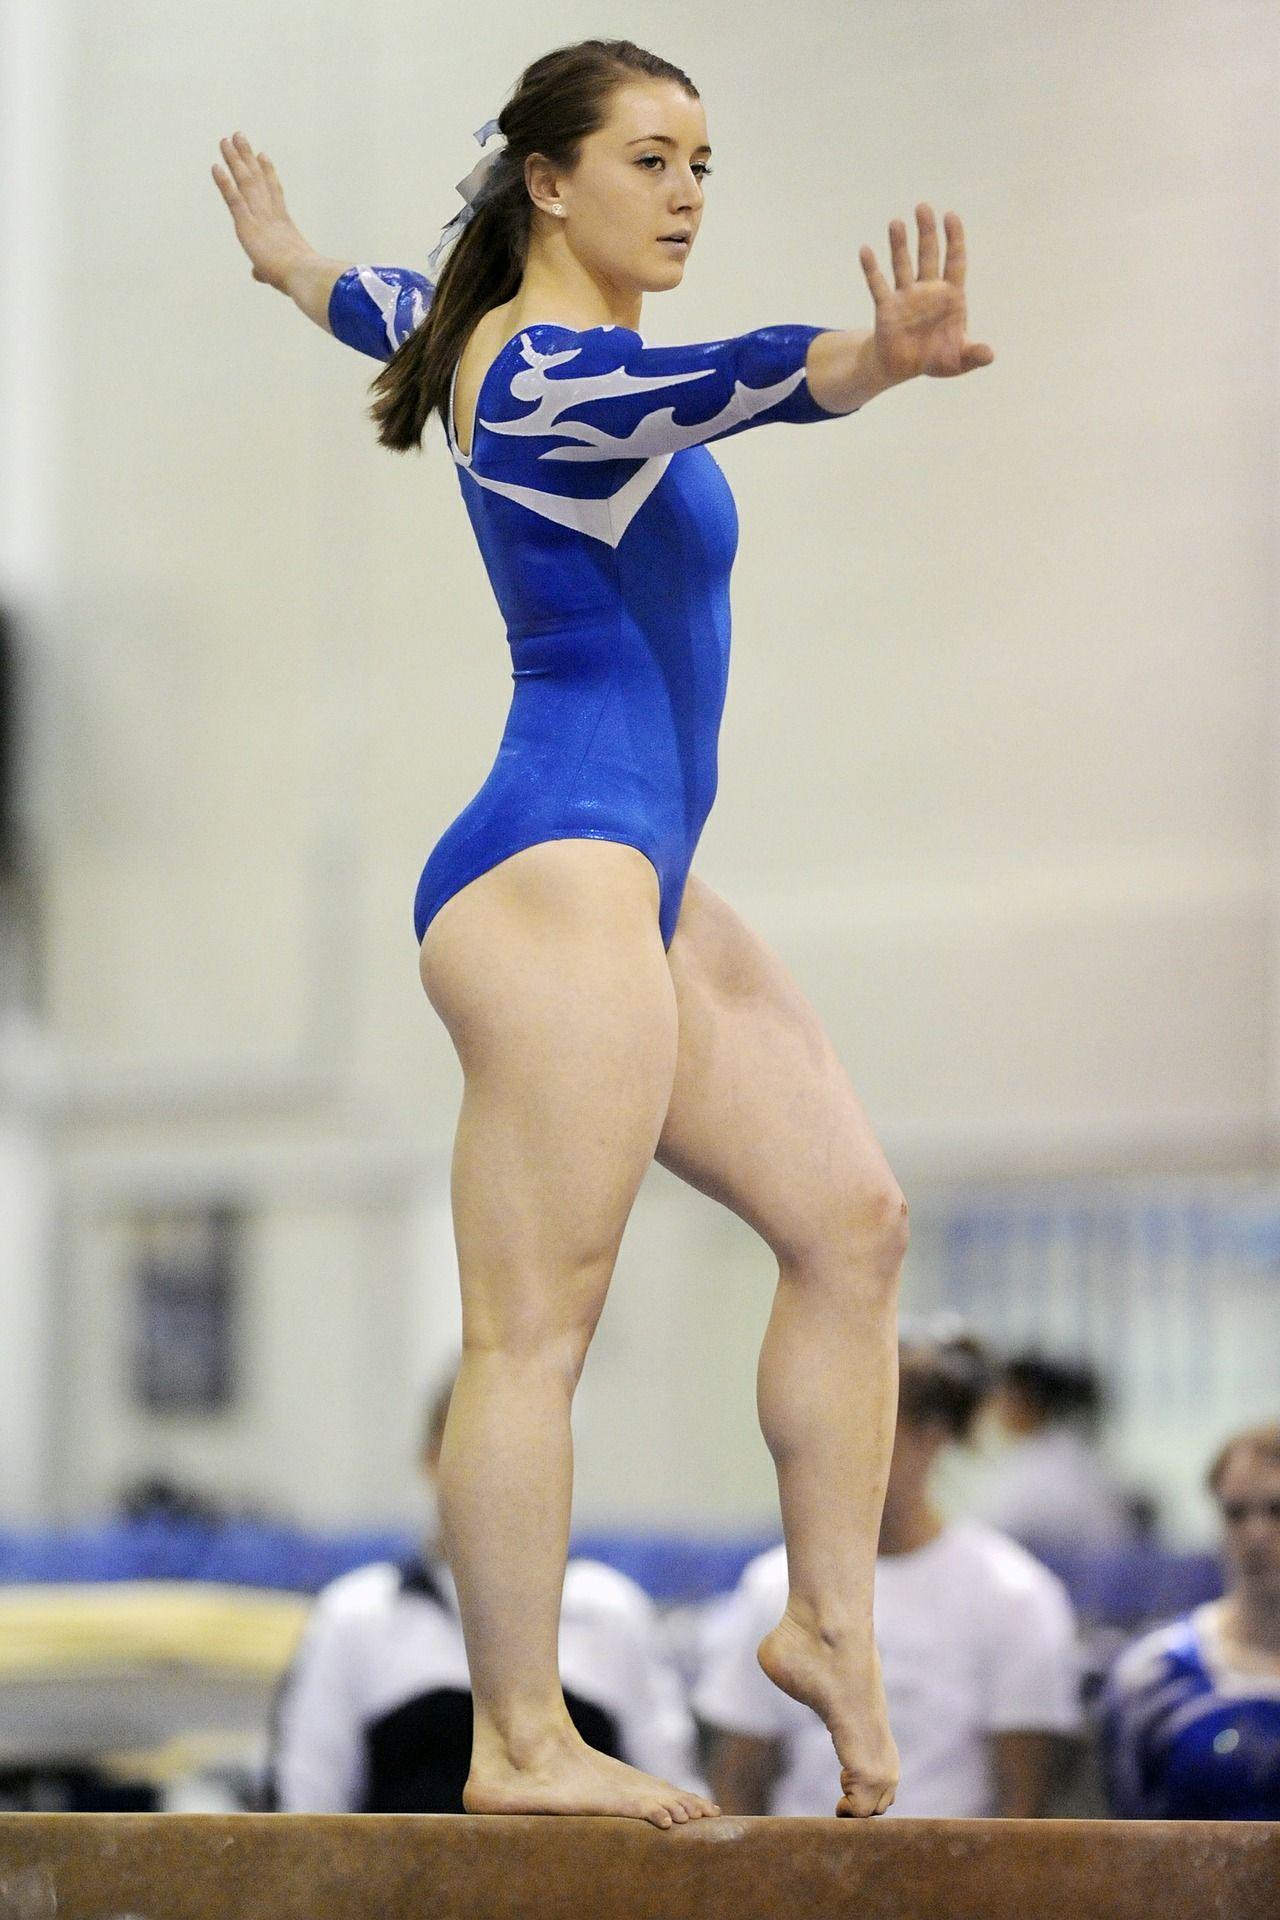 gymnastics global performance testing - HD1200×1800